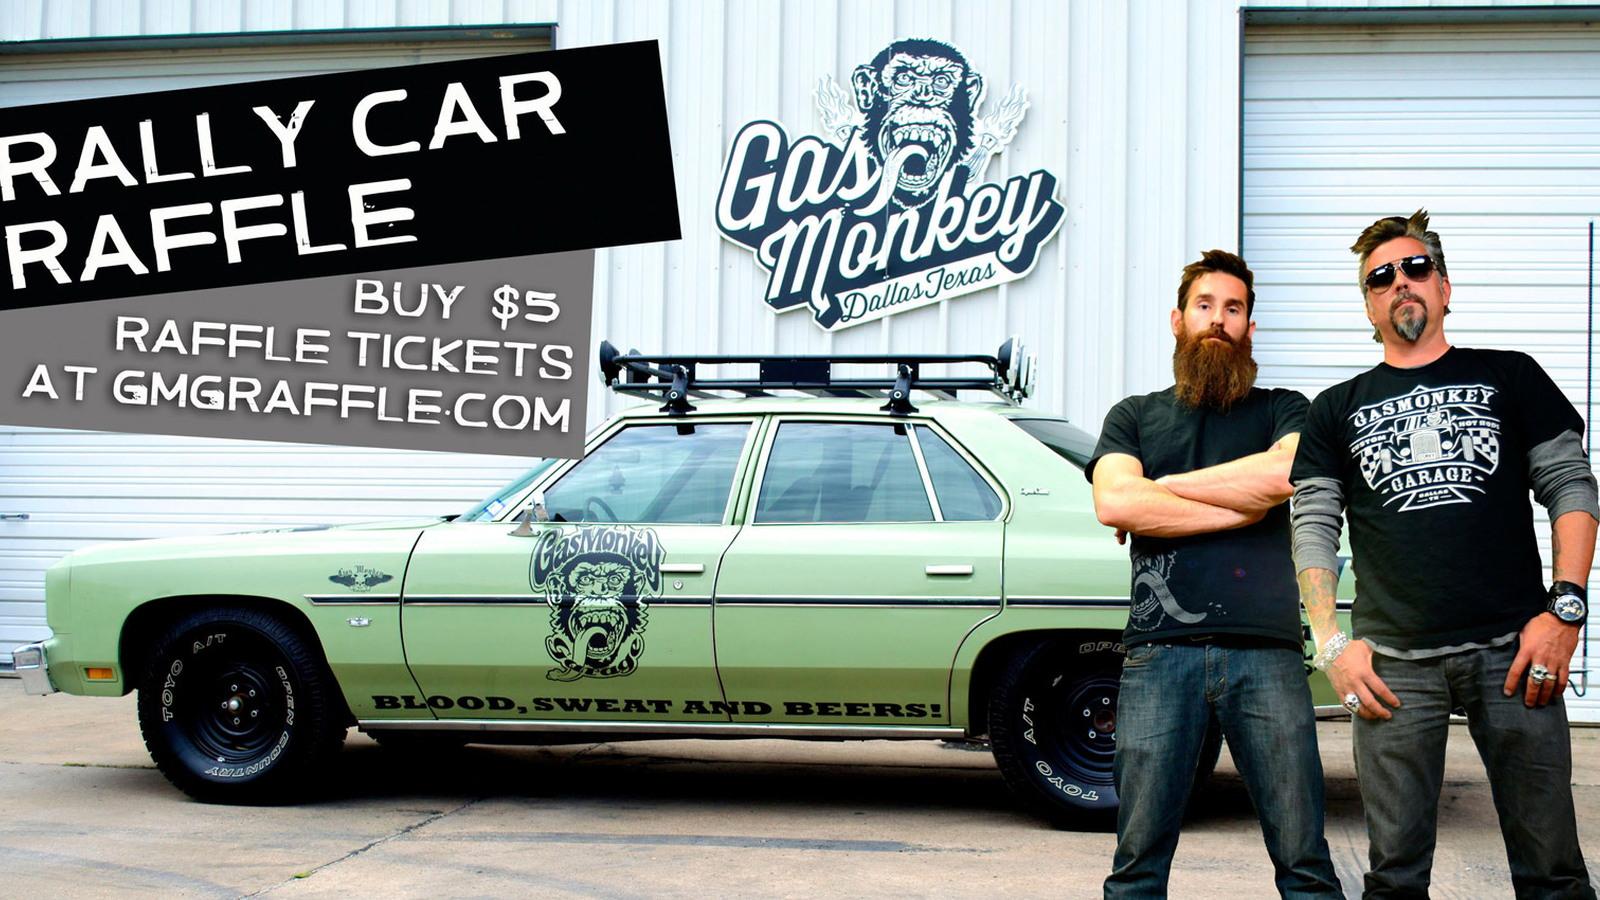 Gas Monkey Garage : Win gas monkey garage s custom chevrolet caprice